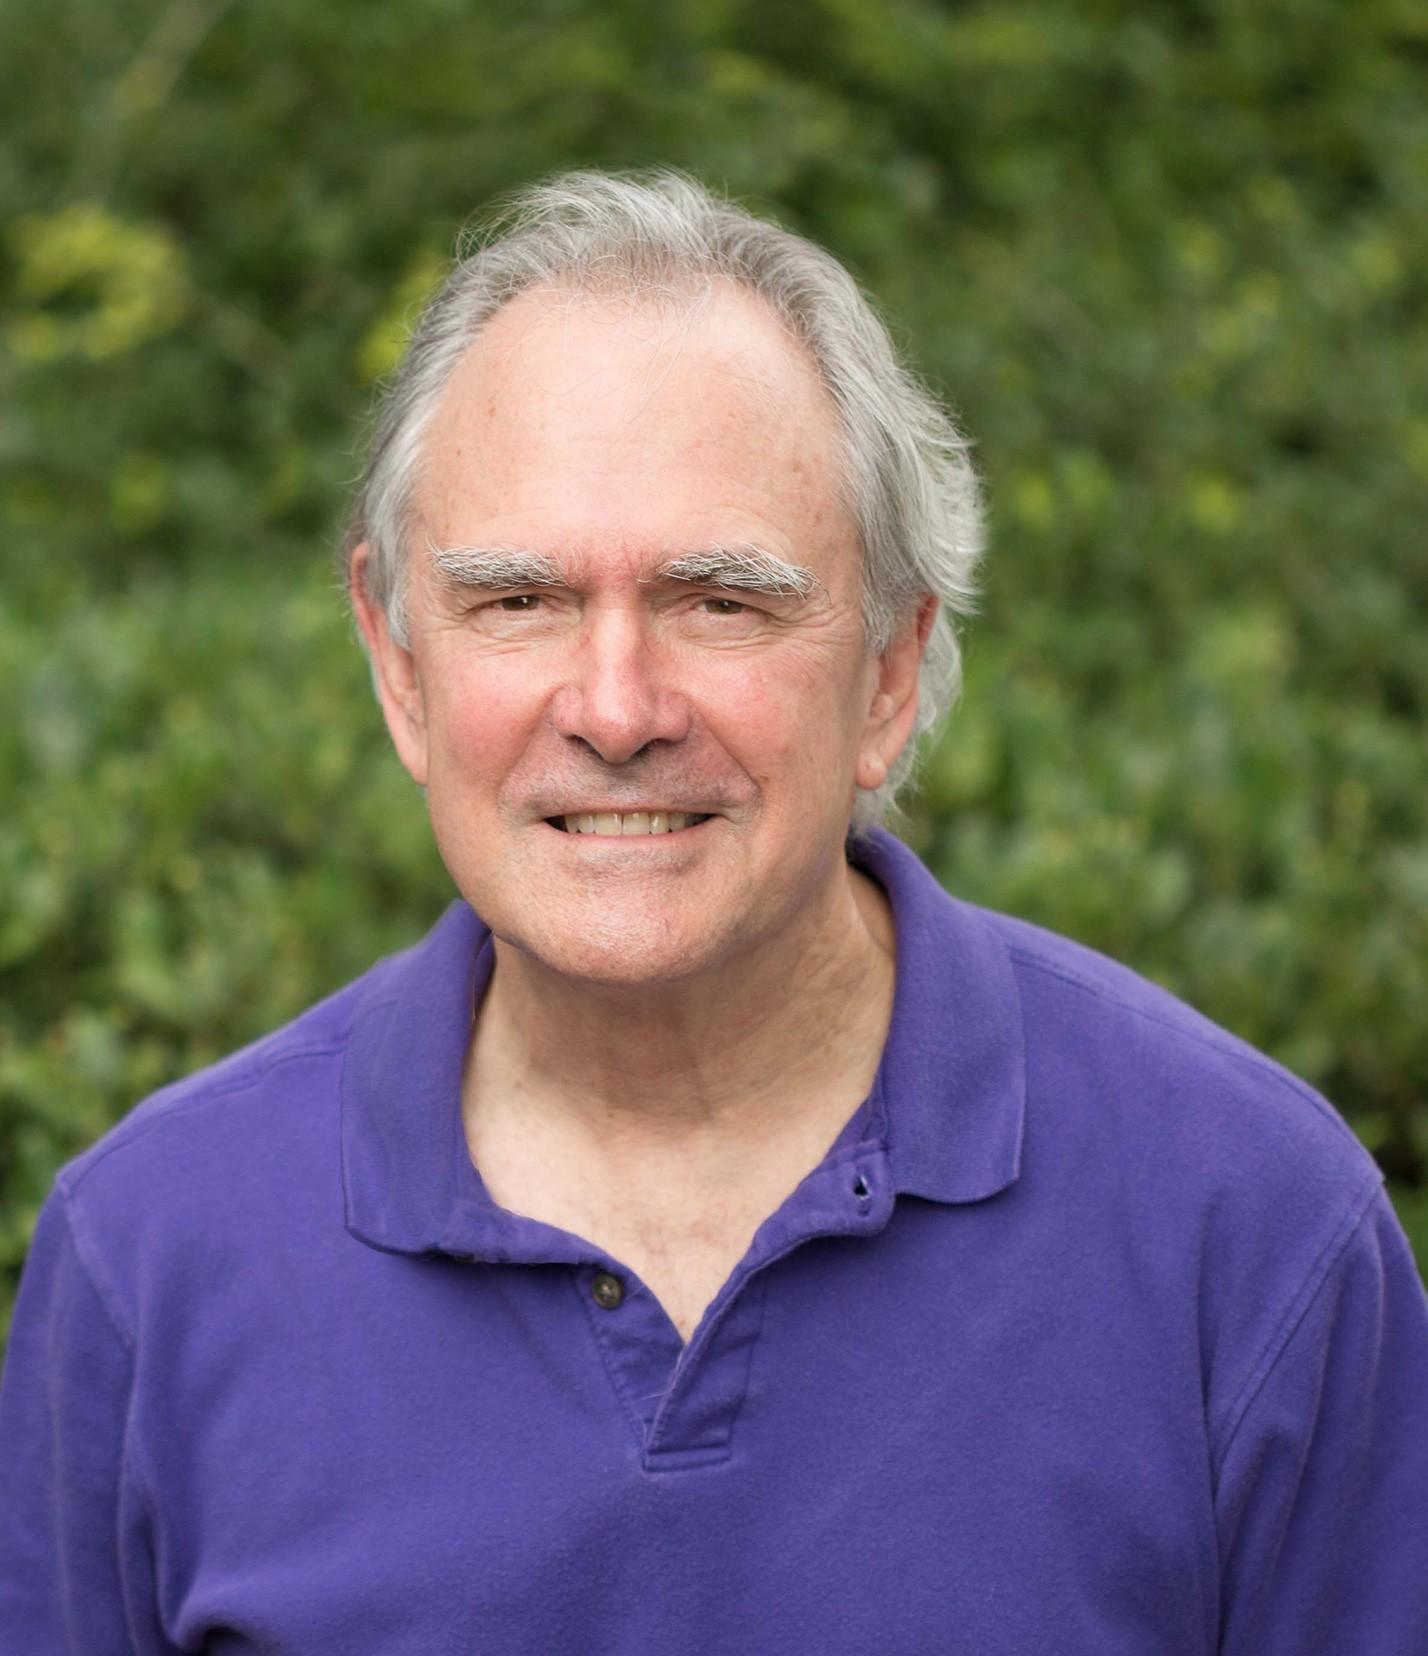 Dr. Marty Lumpkin, PhD's Headshot